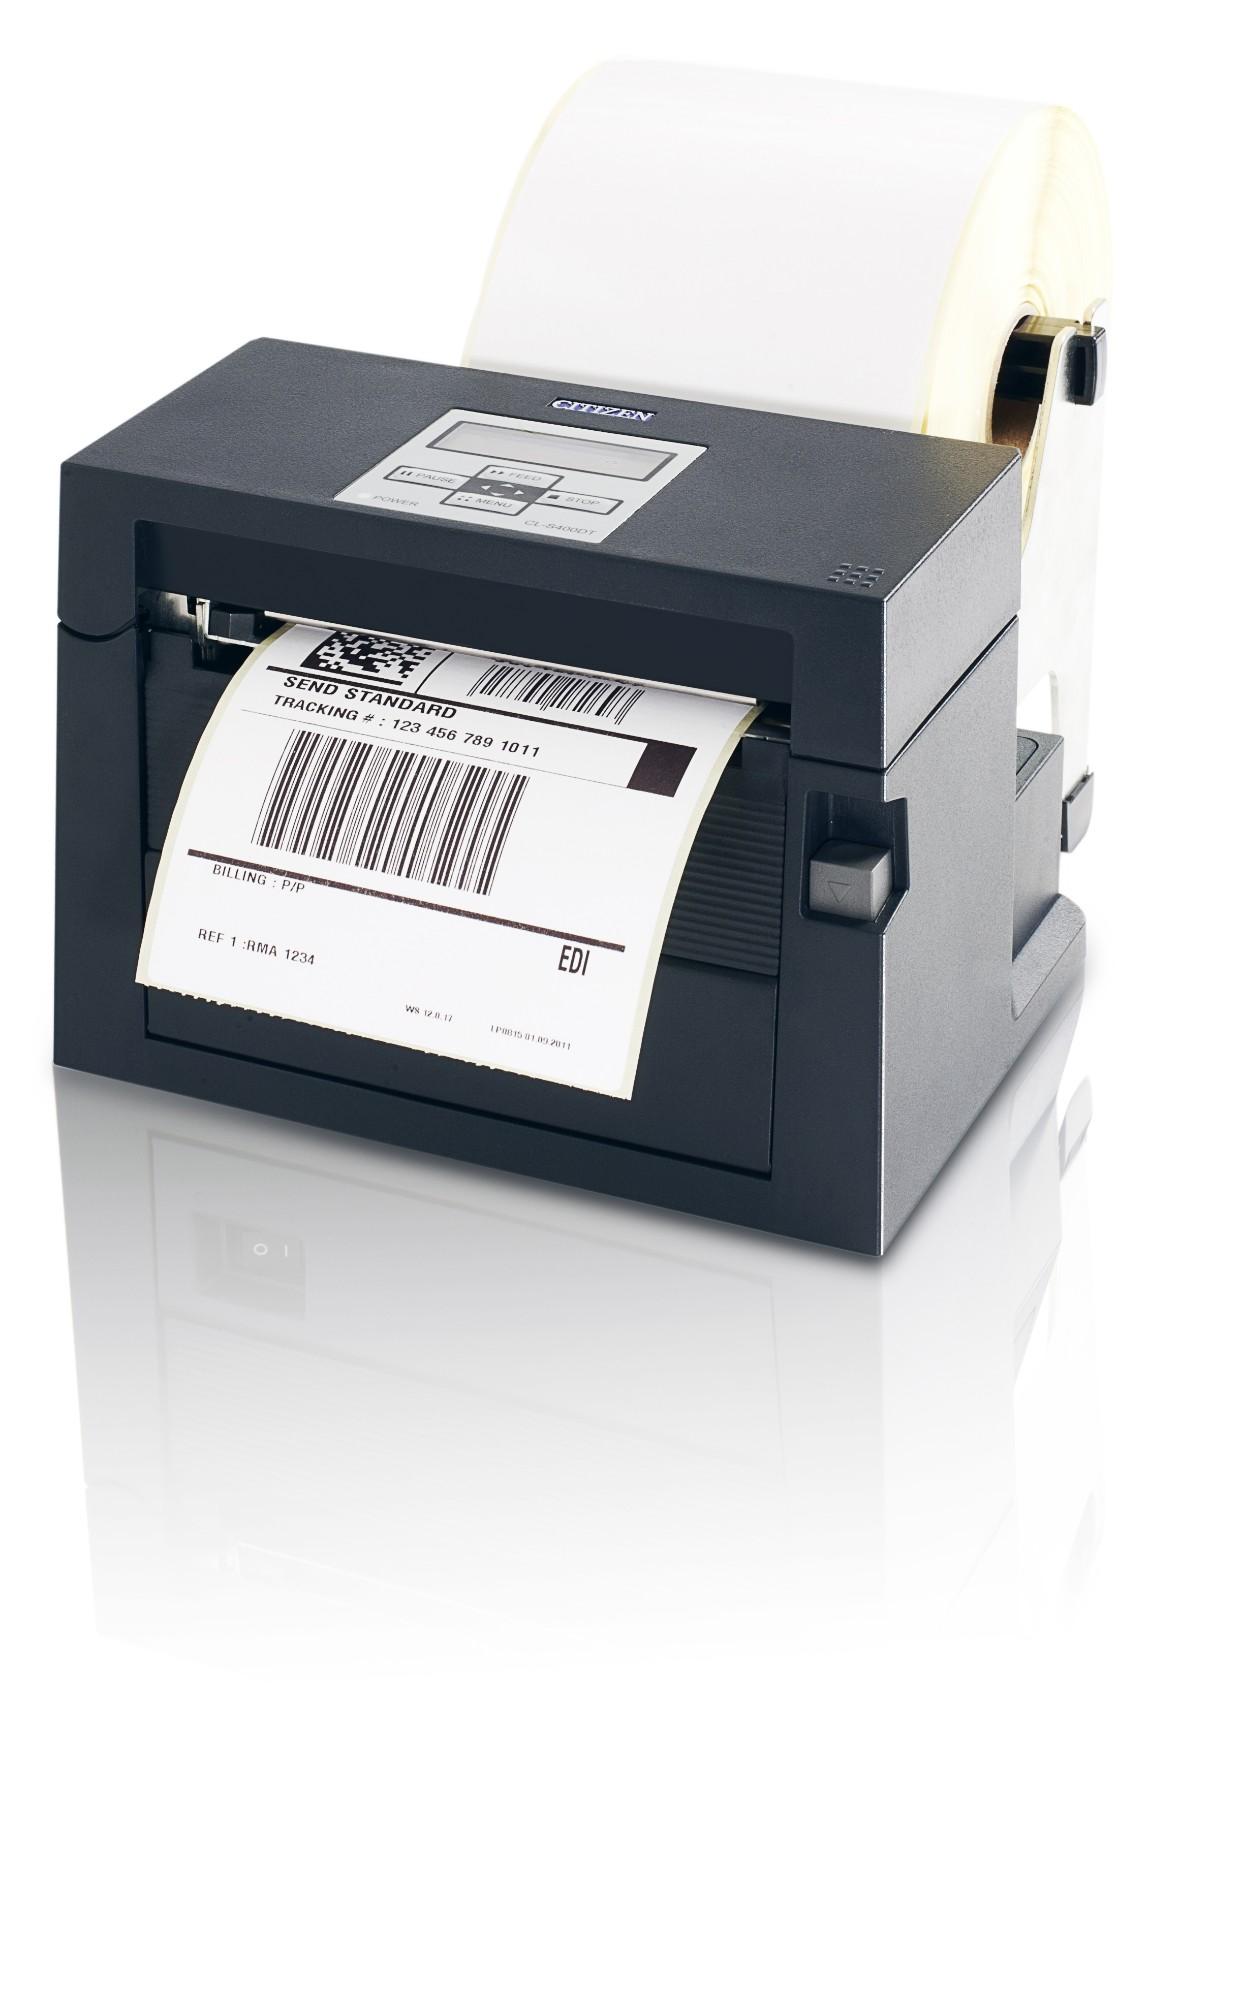 Citizen CL-S400DT impresora de etiquetas Térmica directa 203 x 203 DPI